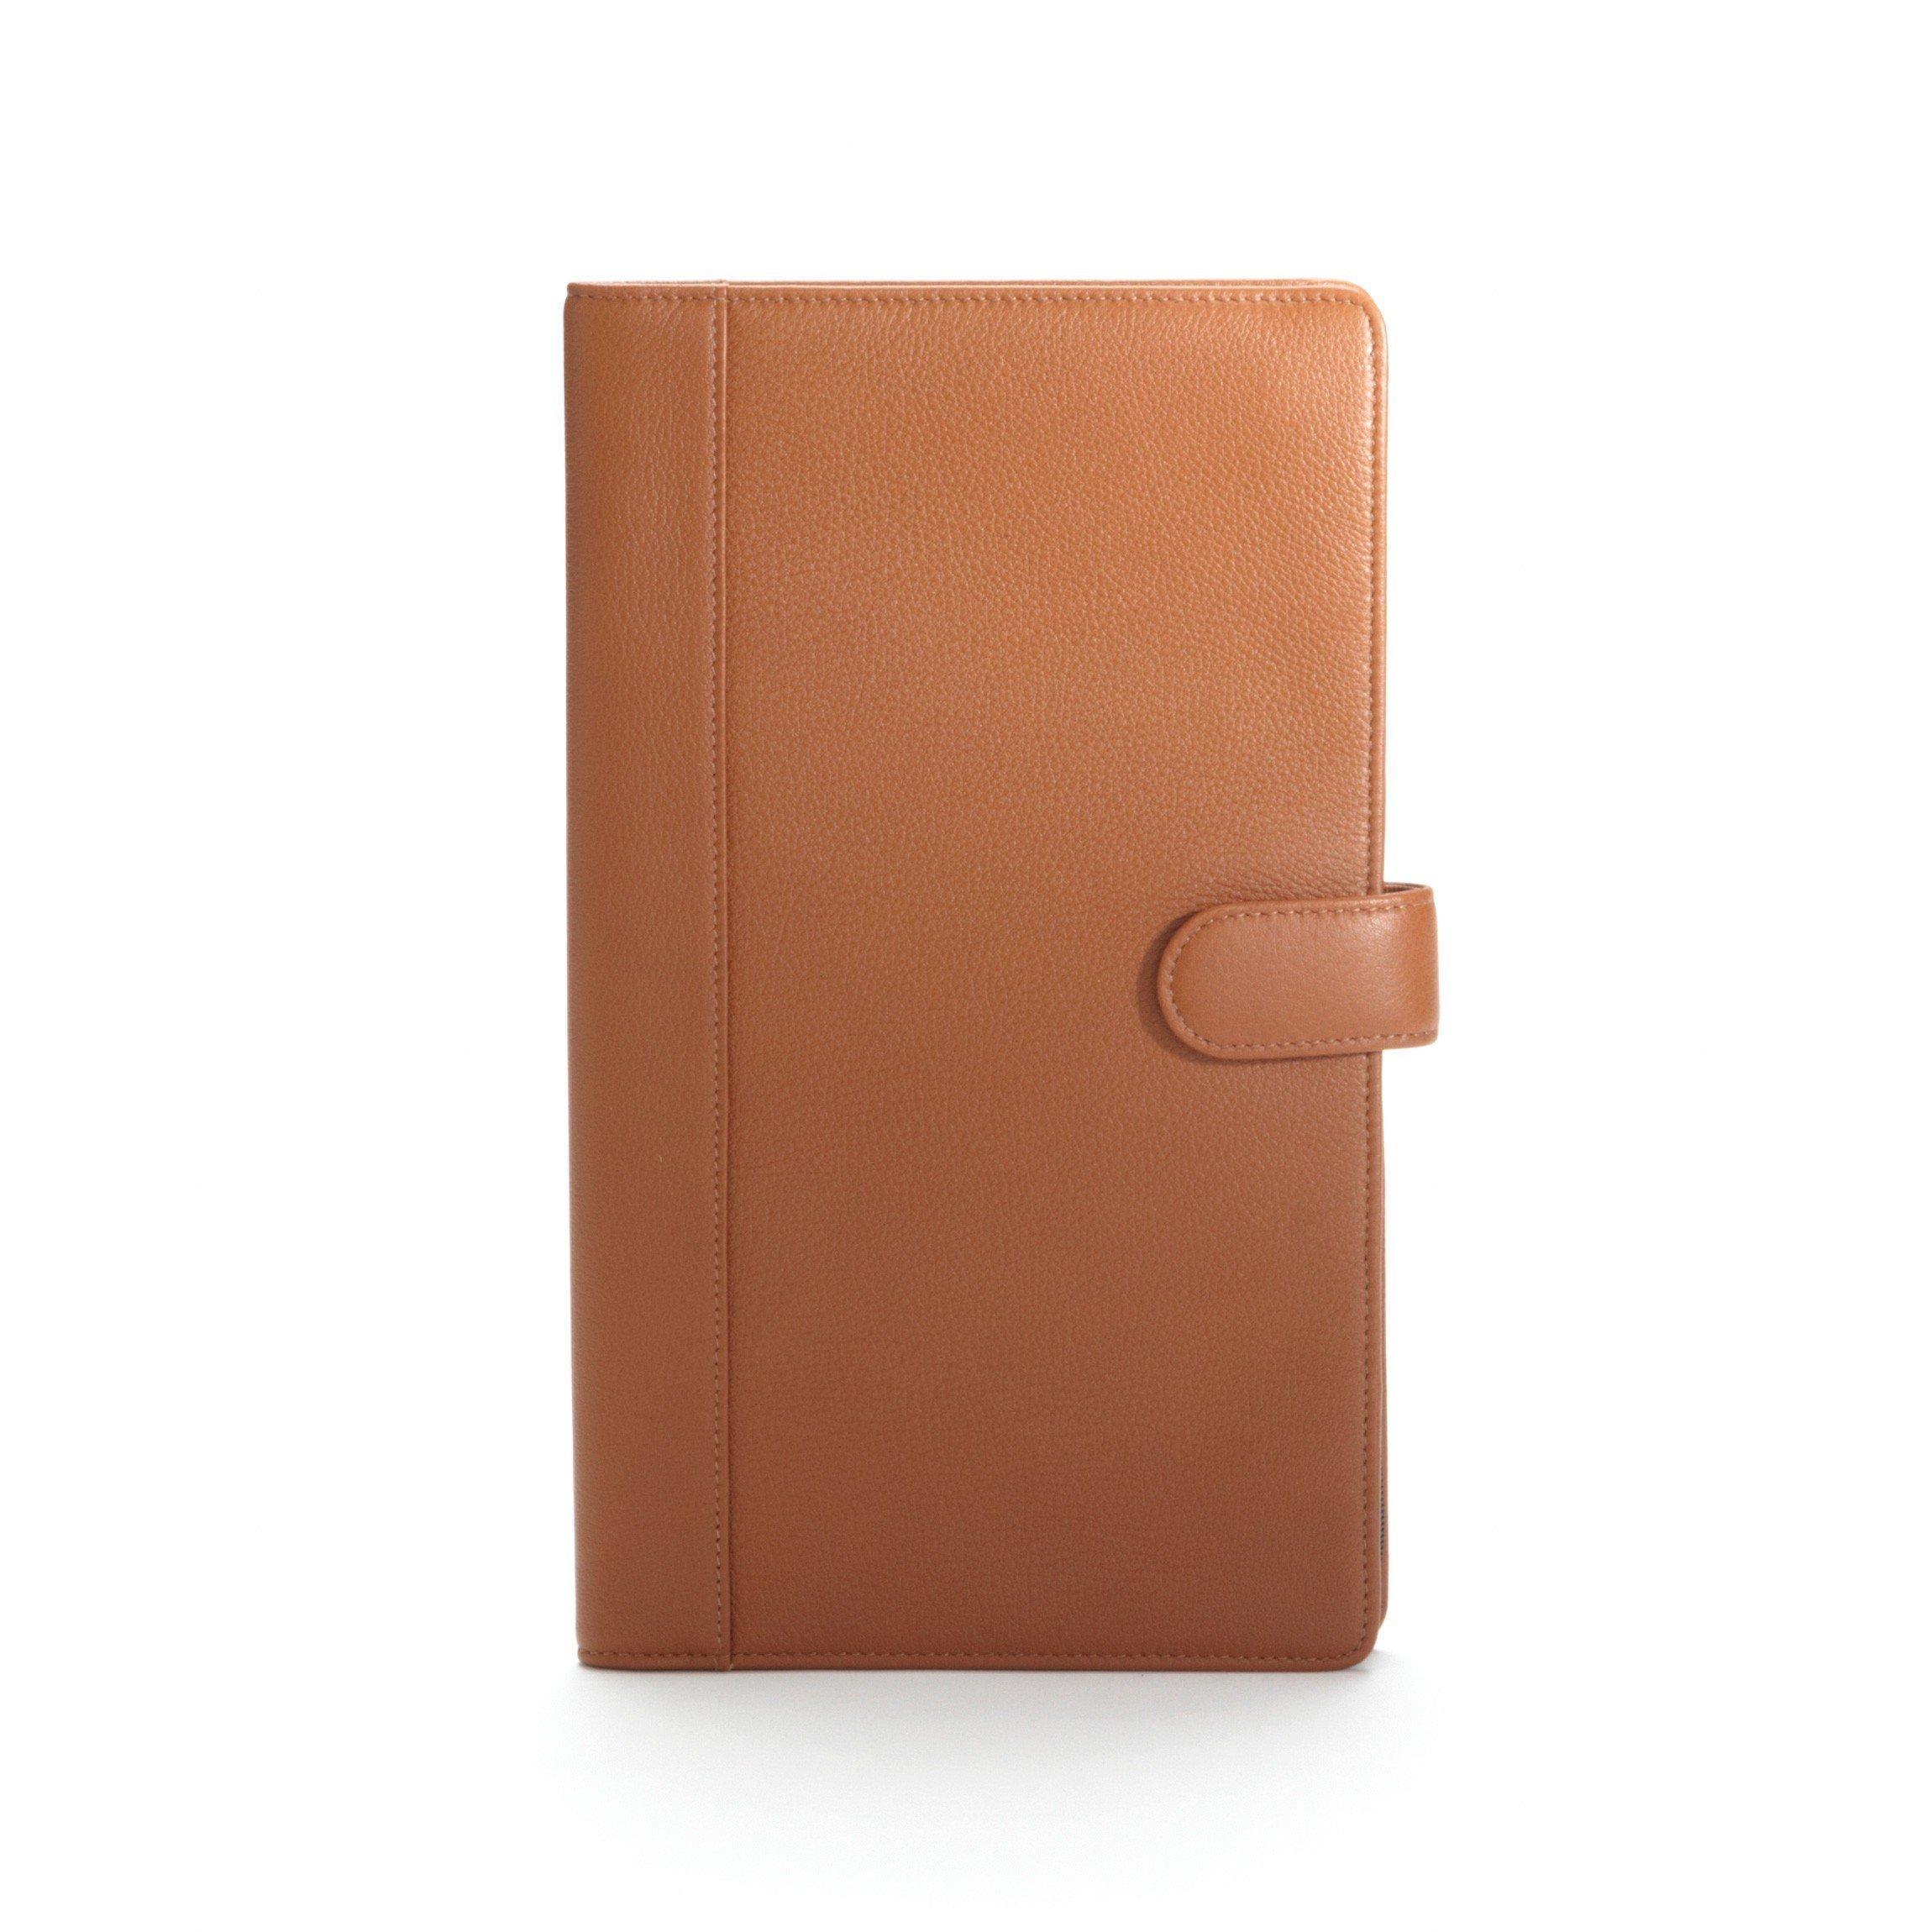 Jewelry Portfolio - Full Grain Leather - Cognac (brown)